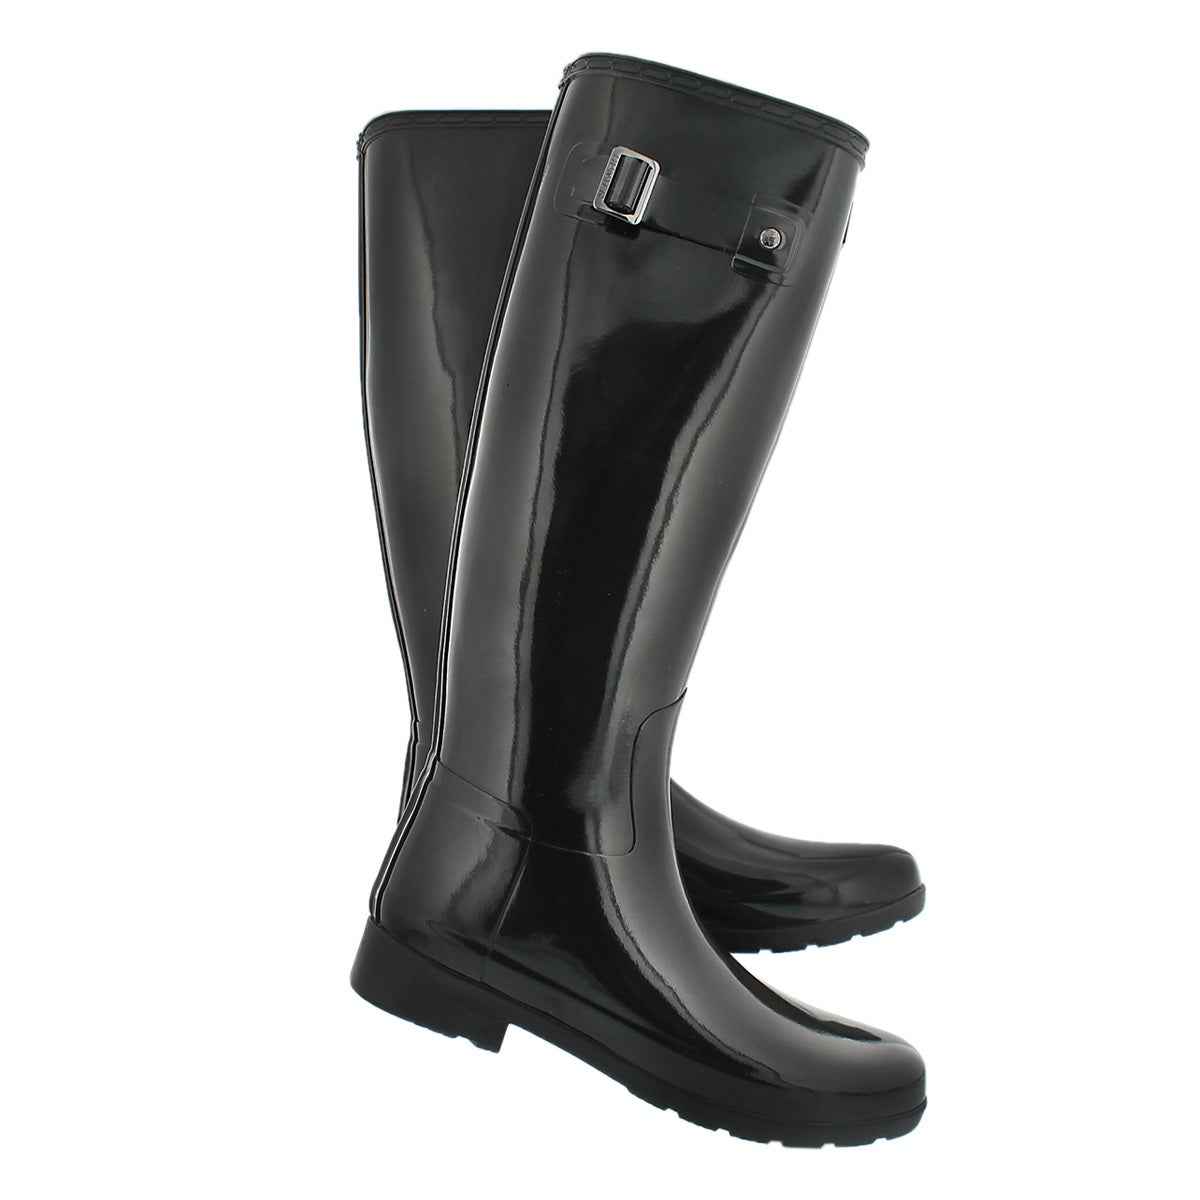 Lds Orig Refined Gloss black rain boot